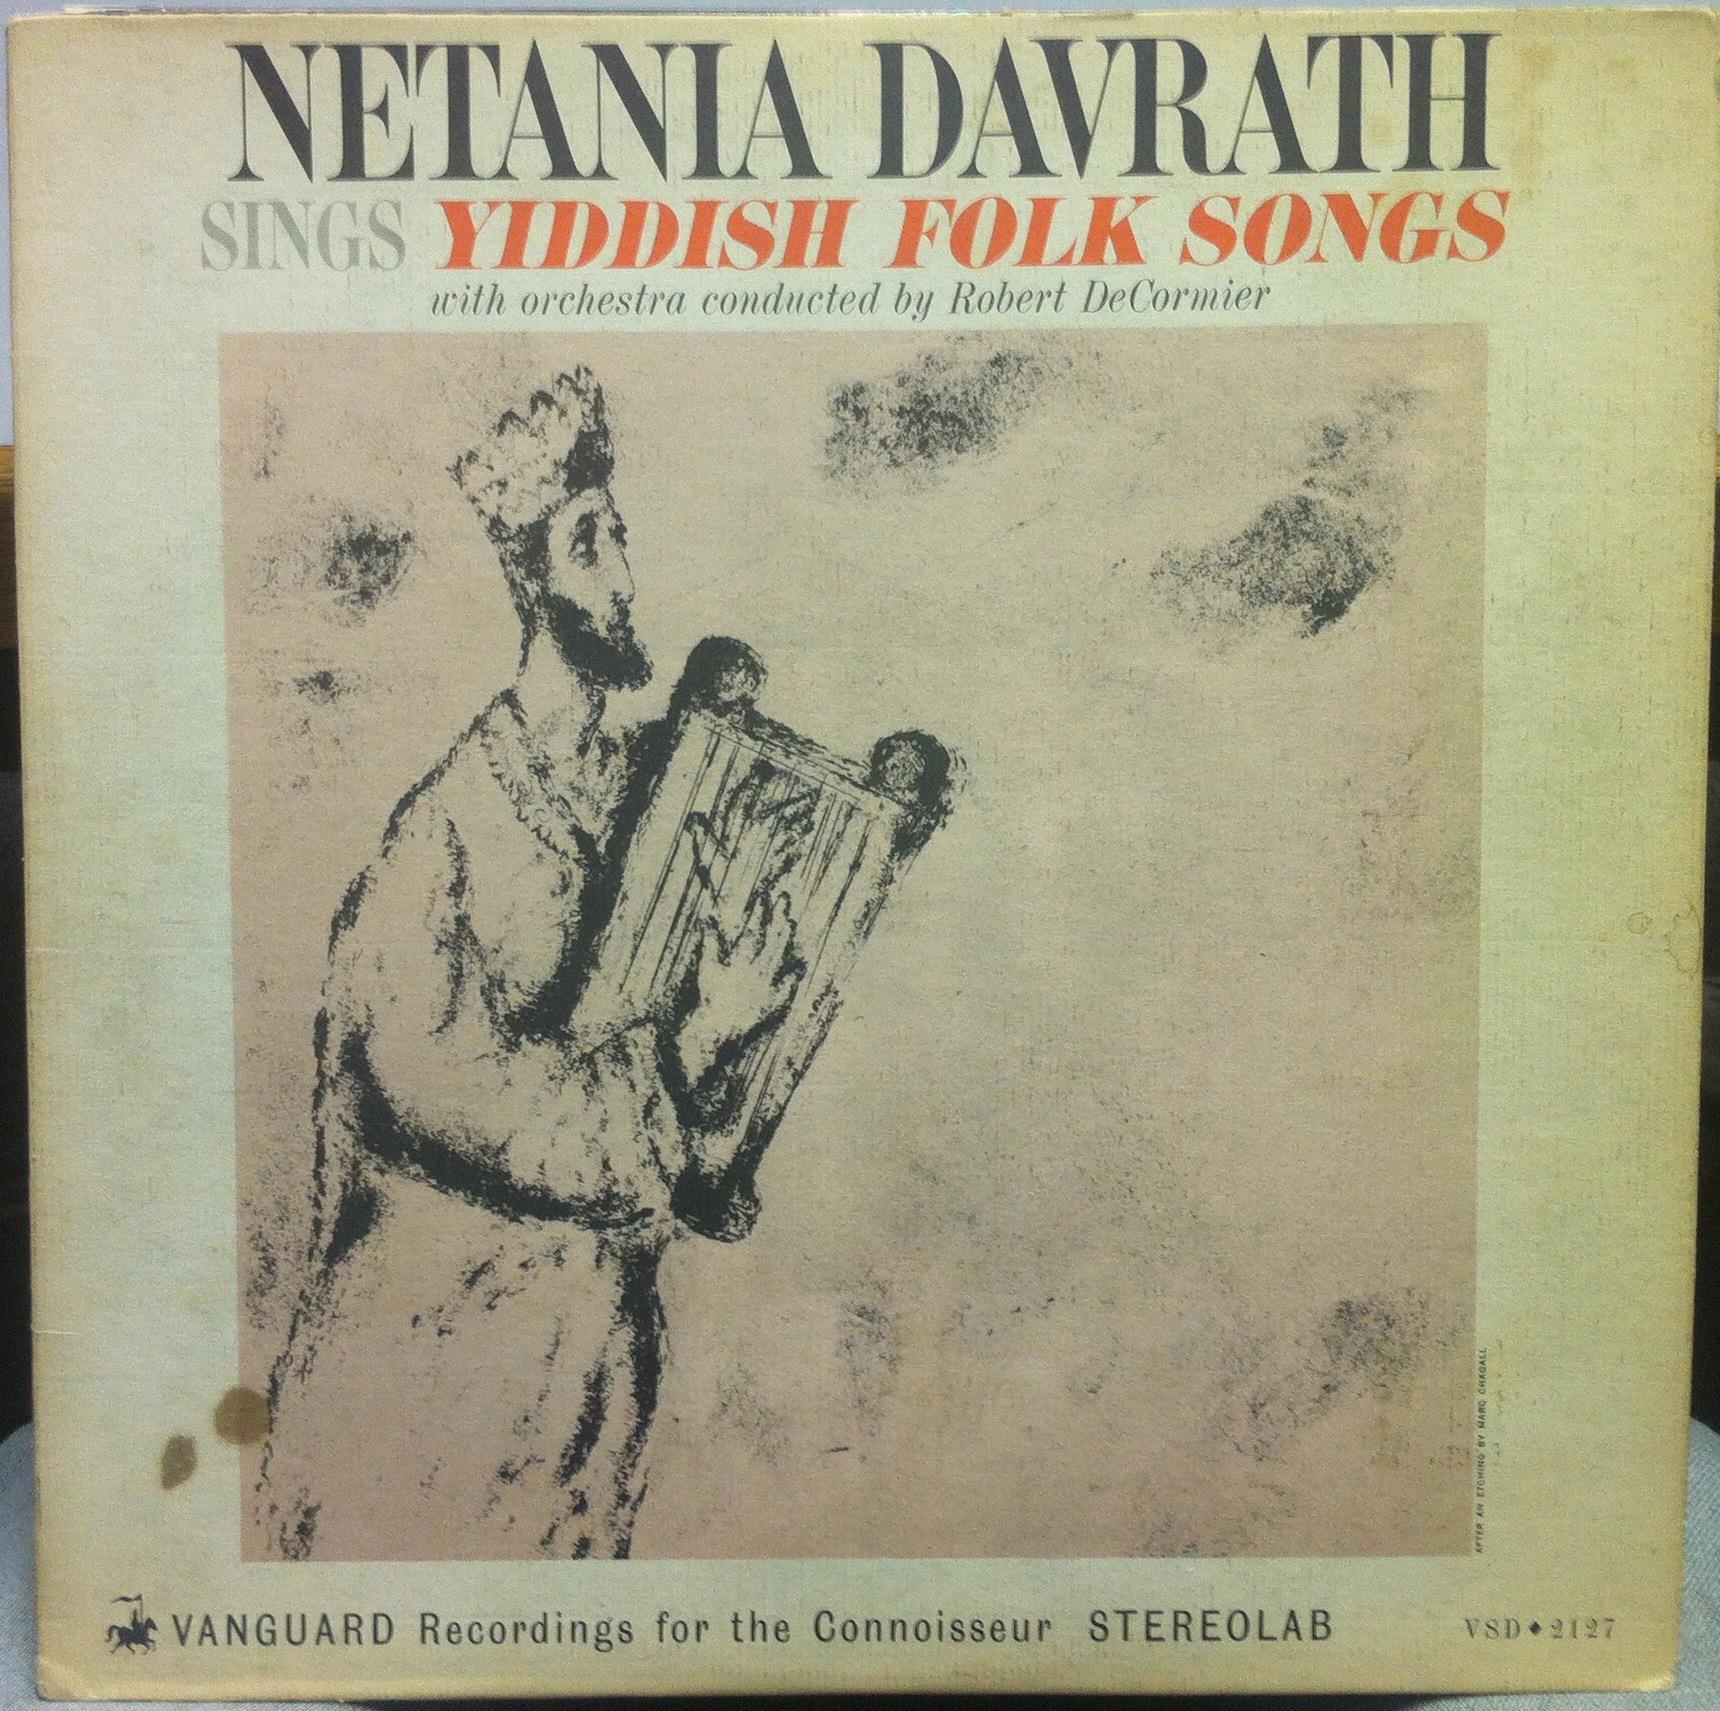 Netania Davrath Sings Yiddish Folk Songs Lp Vg